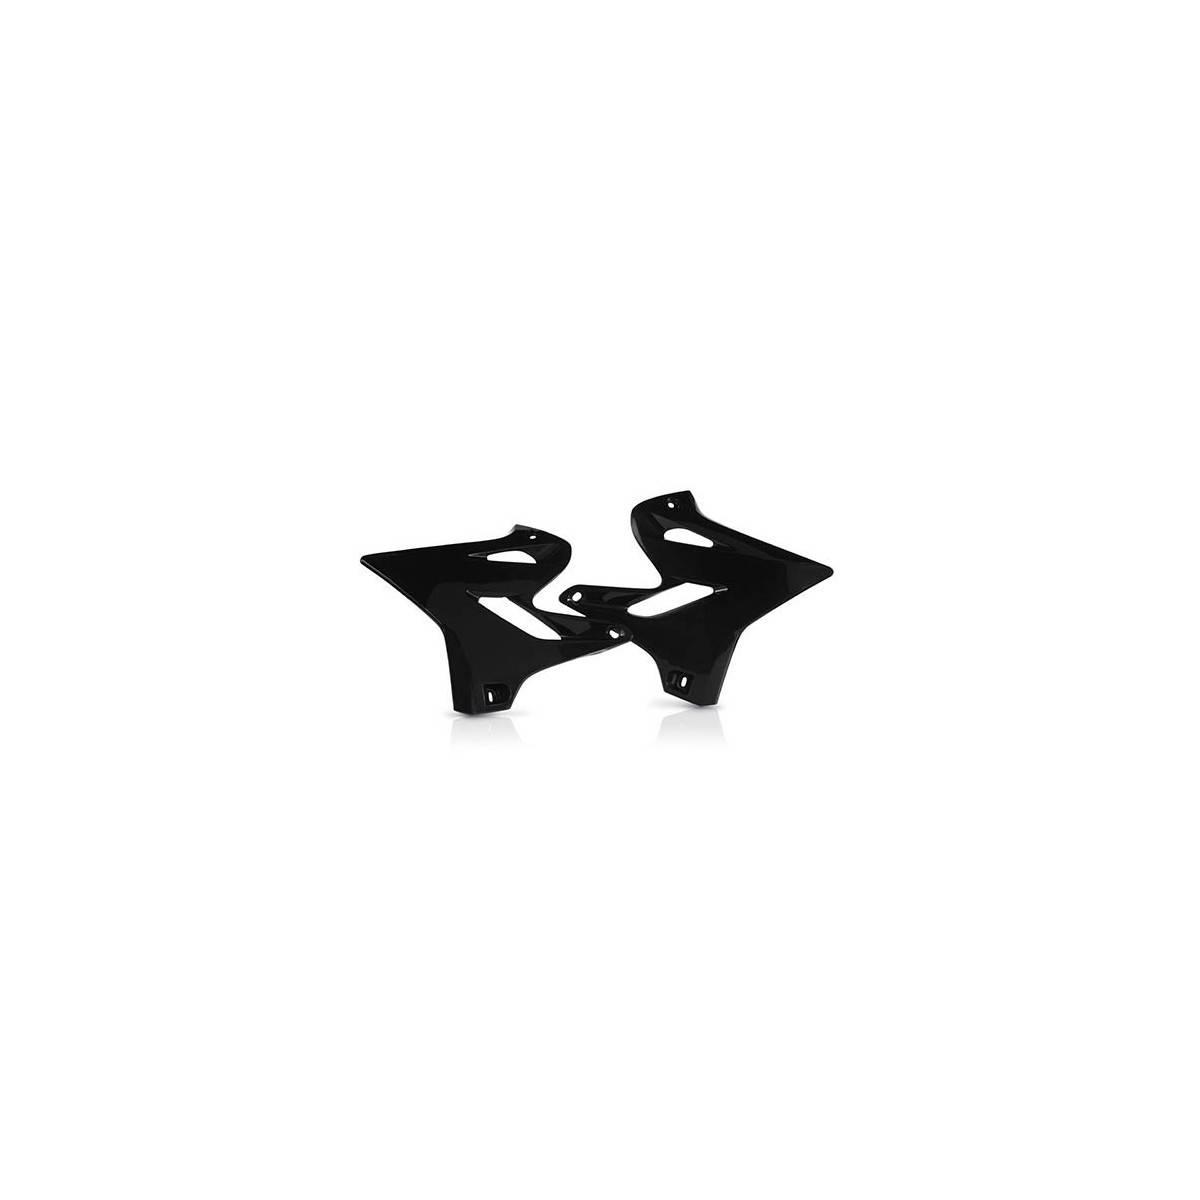 0017871-090 - Tapa Radiador Yamaha Yz125 250 15 18 Negro